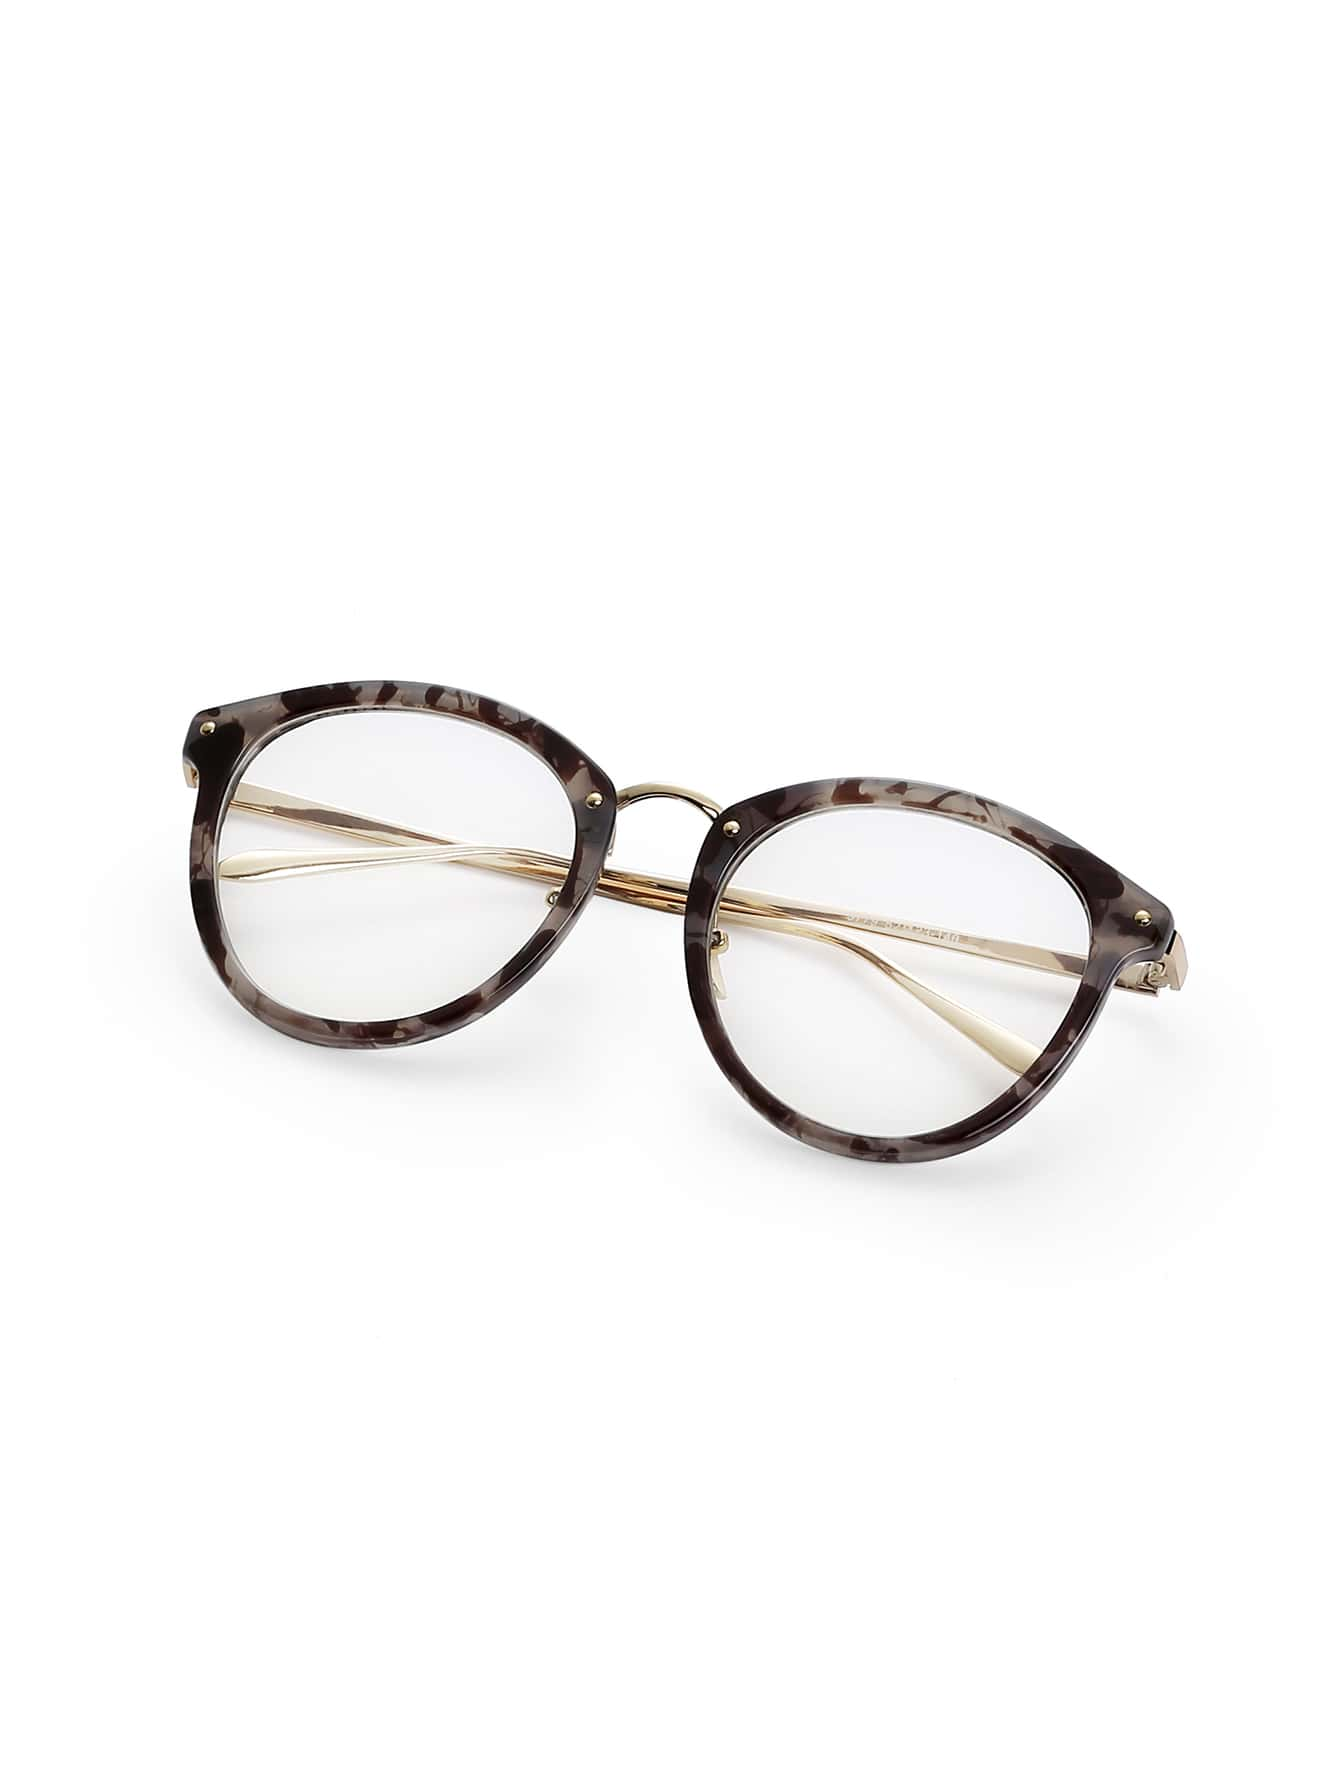 068990f04799 Grey Tortoise Eyeglass Frames - Bitterroot Public Library